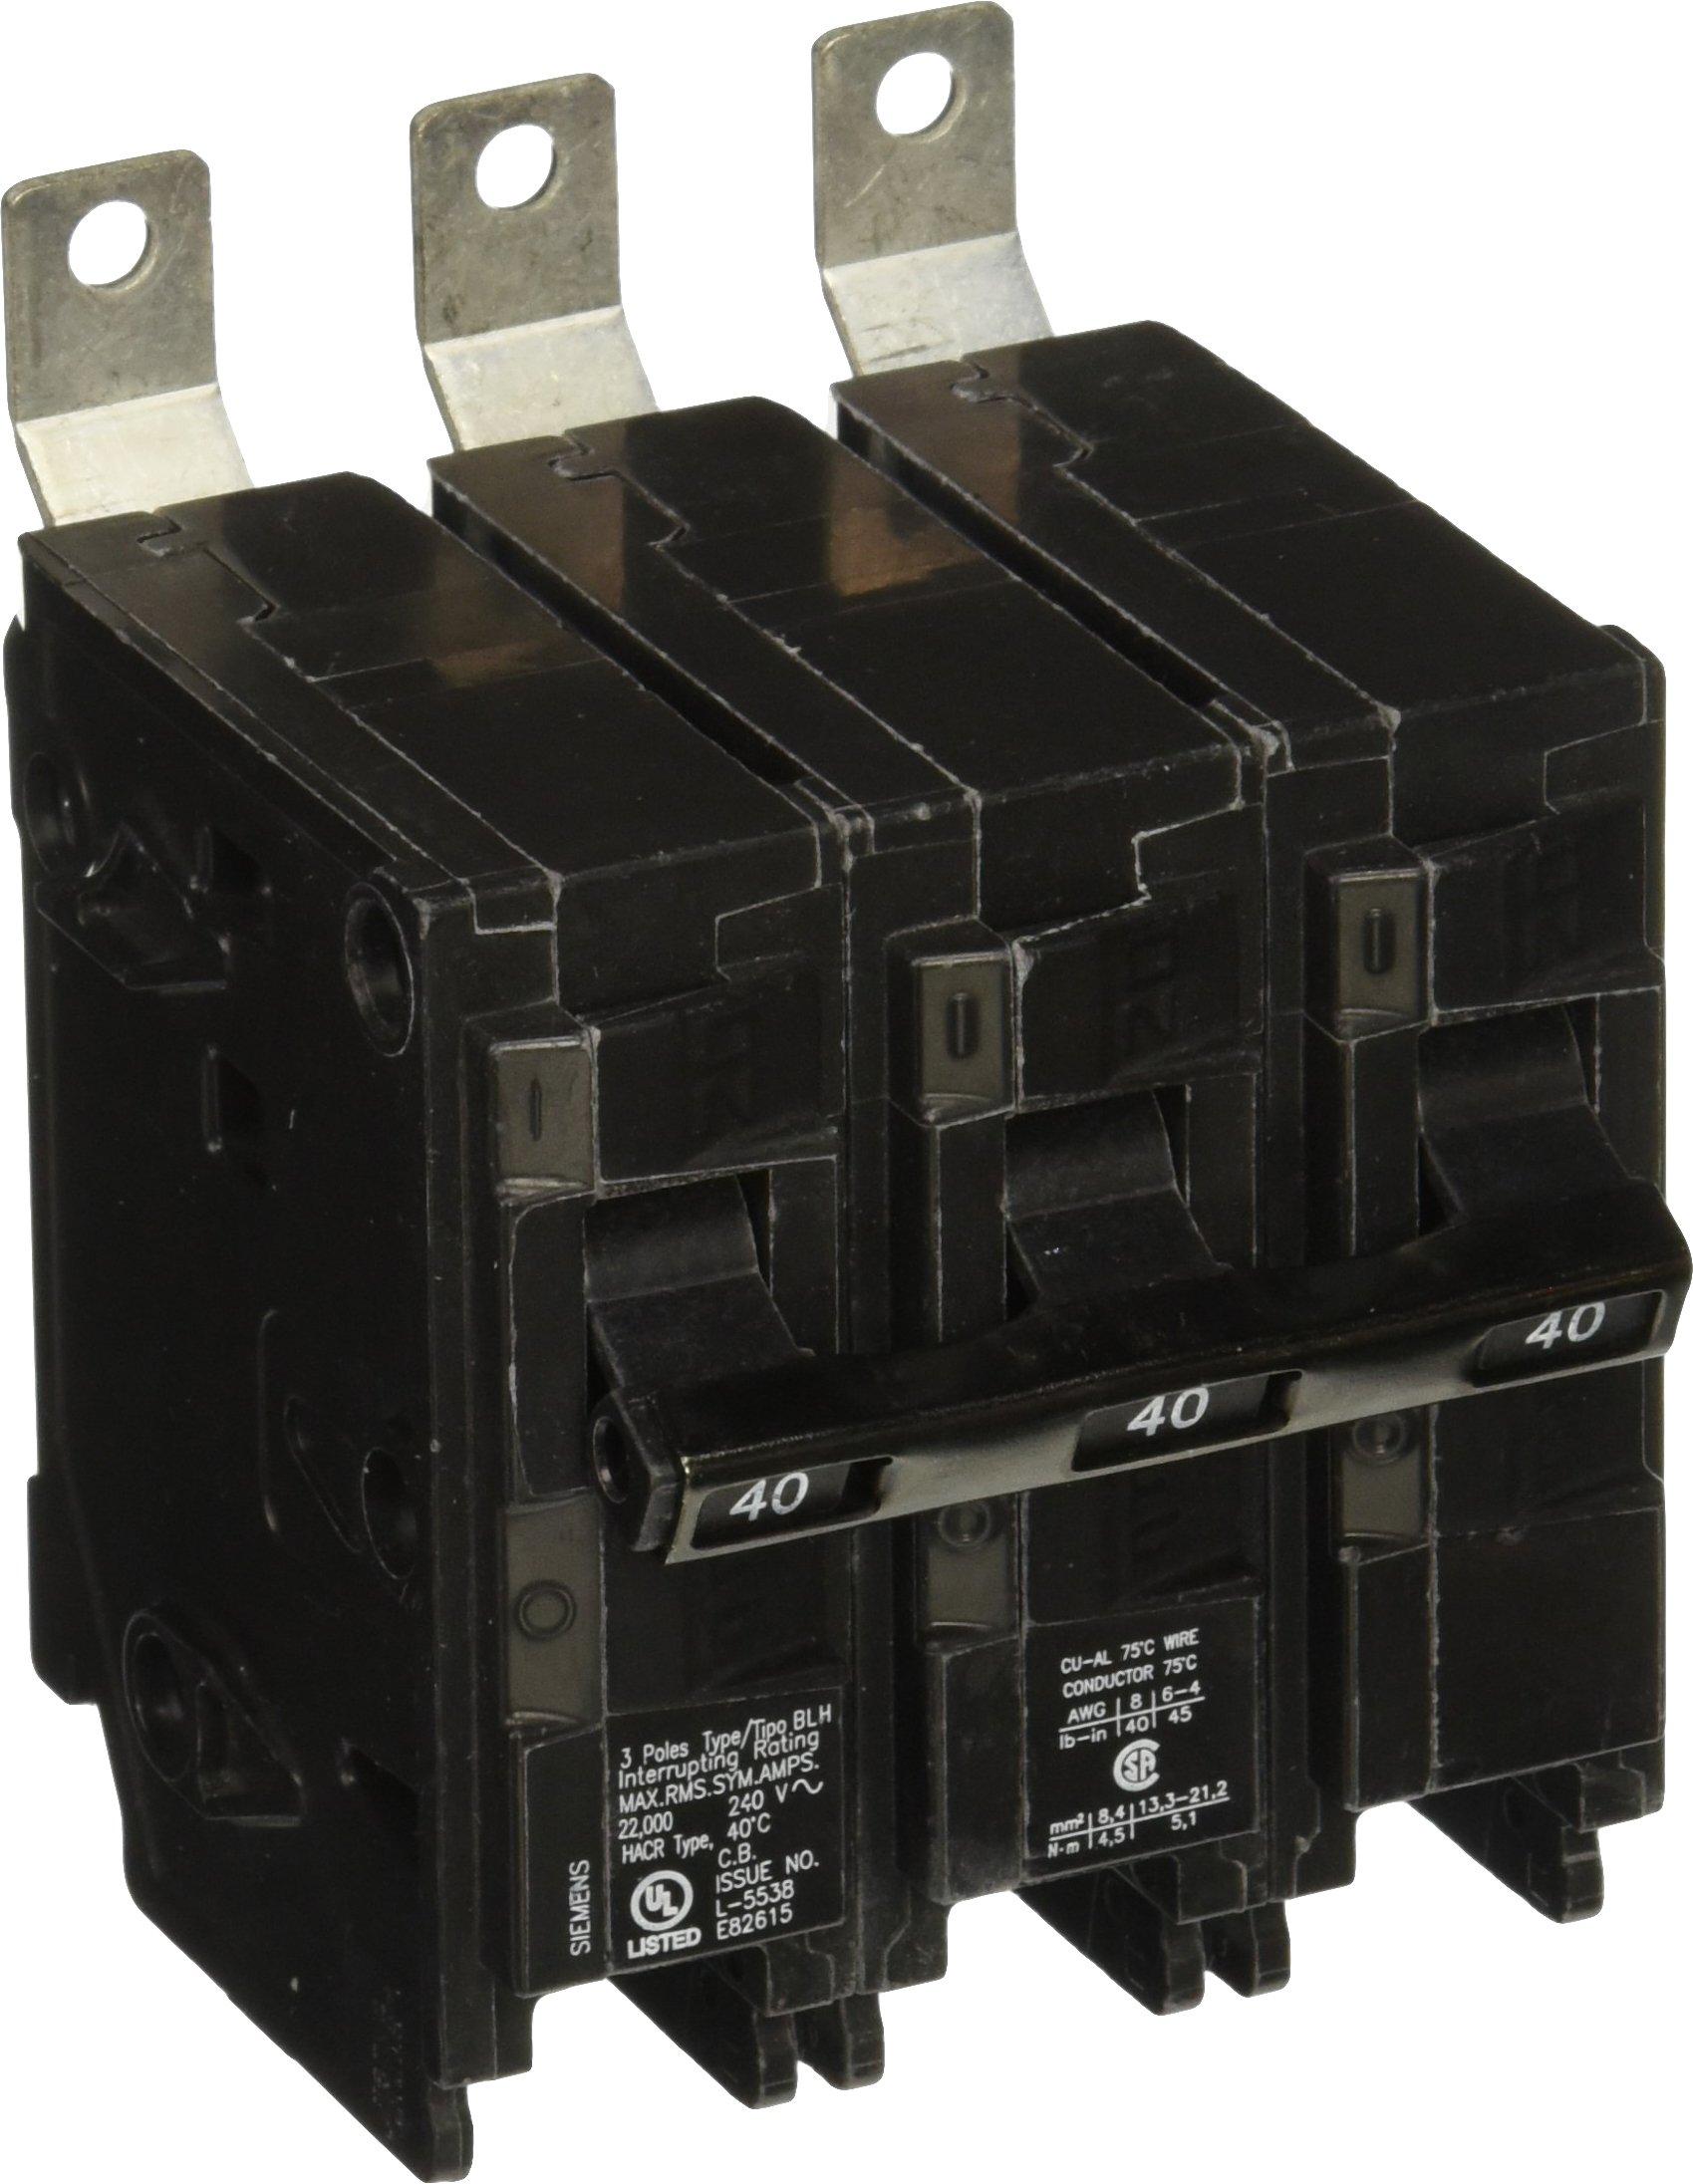 Siemens B340H 40-Amp Three Pole 240-Volt 22KAIC Bolt in Breaker